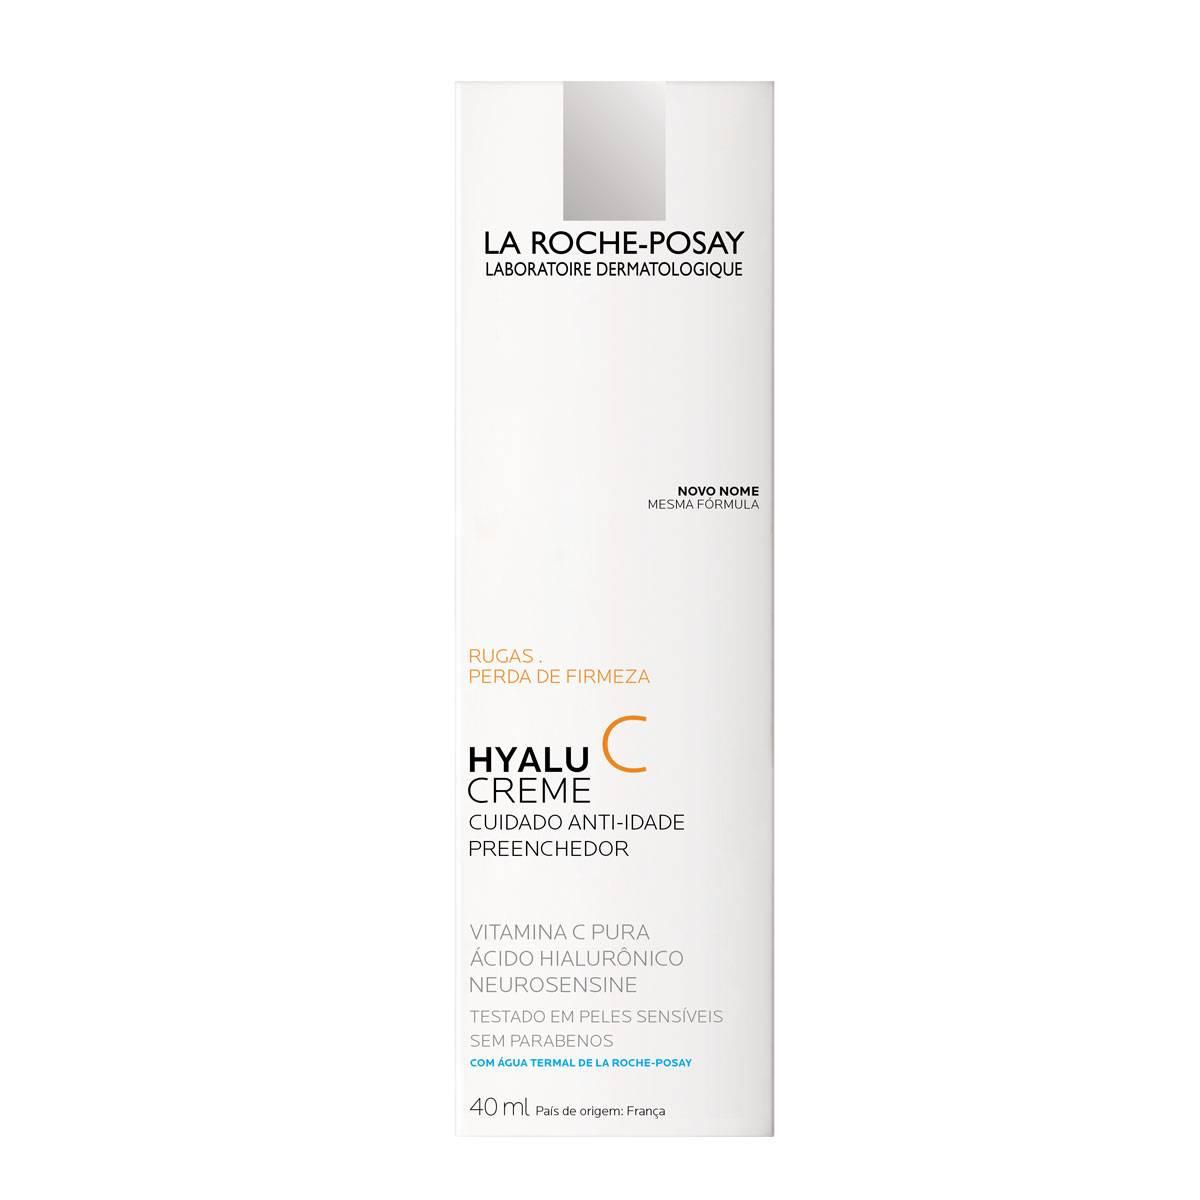 Caixa Hyalu C Creme 40ml   La Roche-Posay